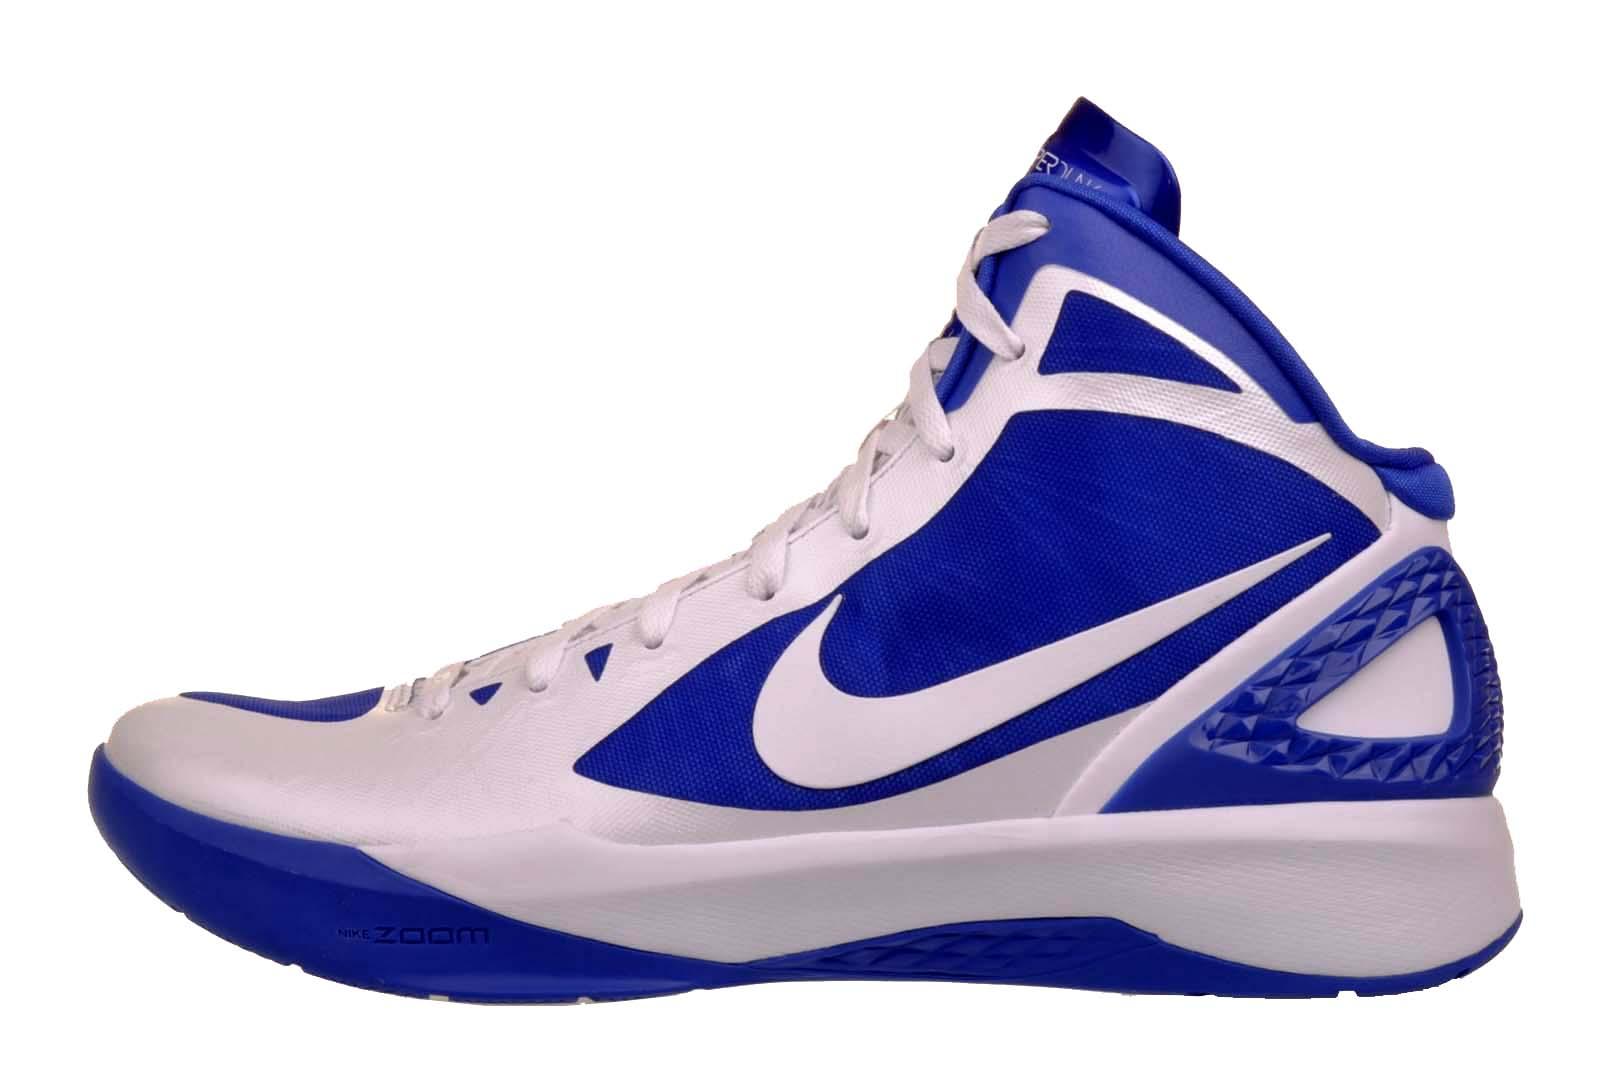 nike zoom hyperdunk 2011 mens basketball shoes white